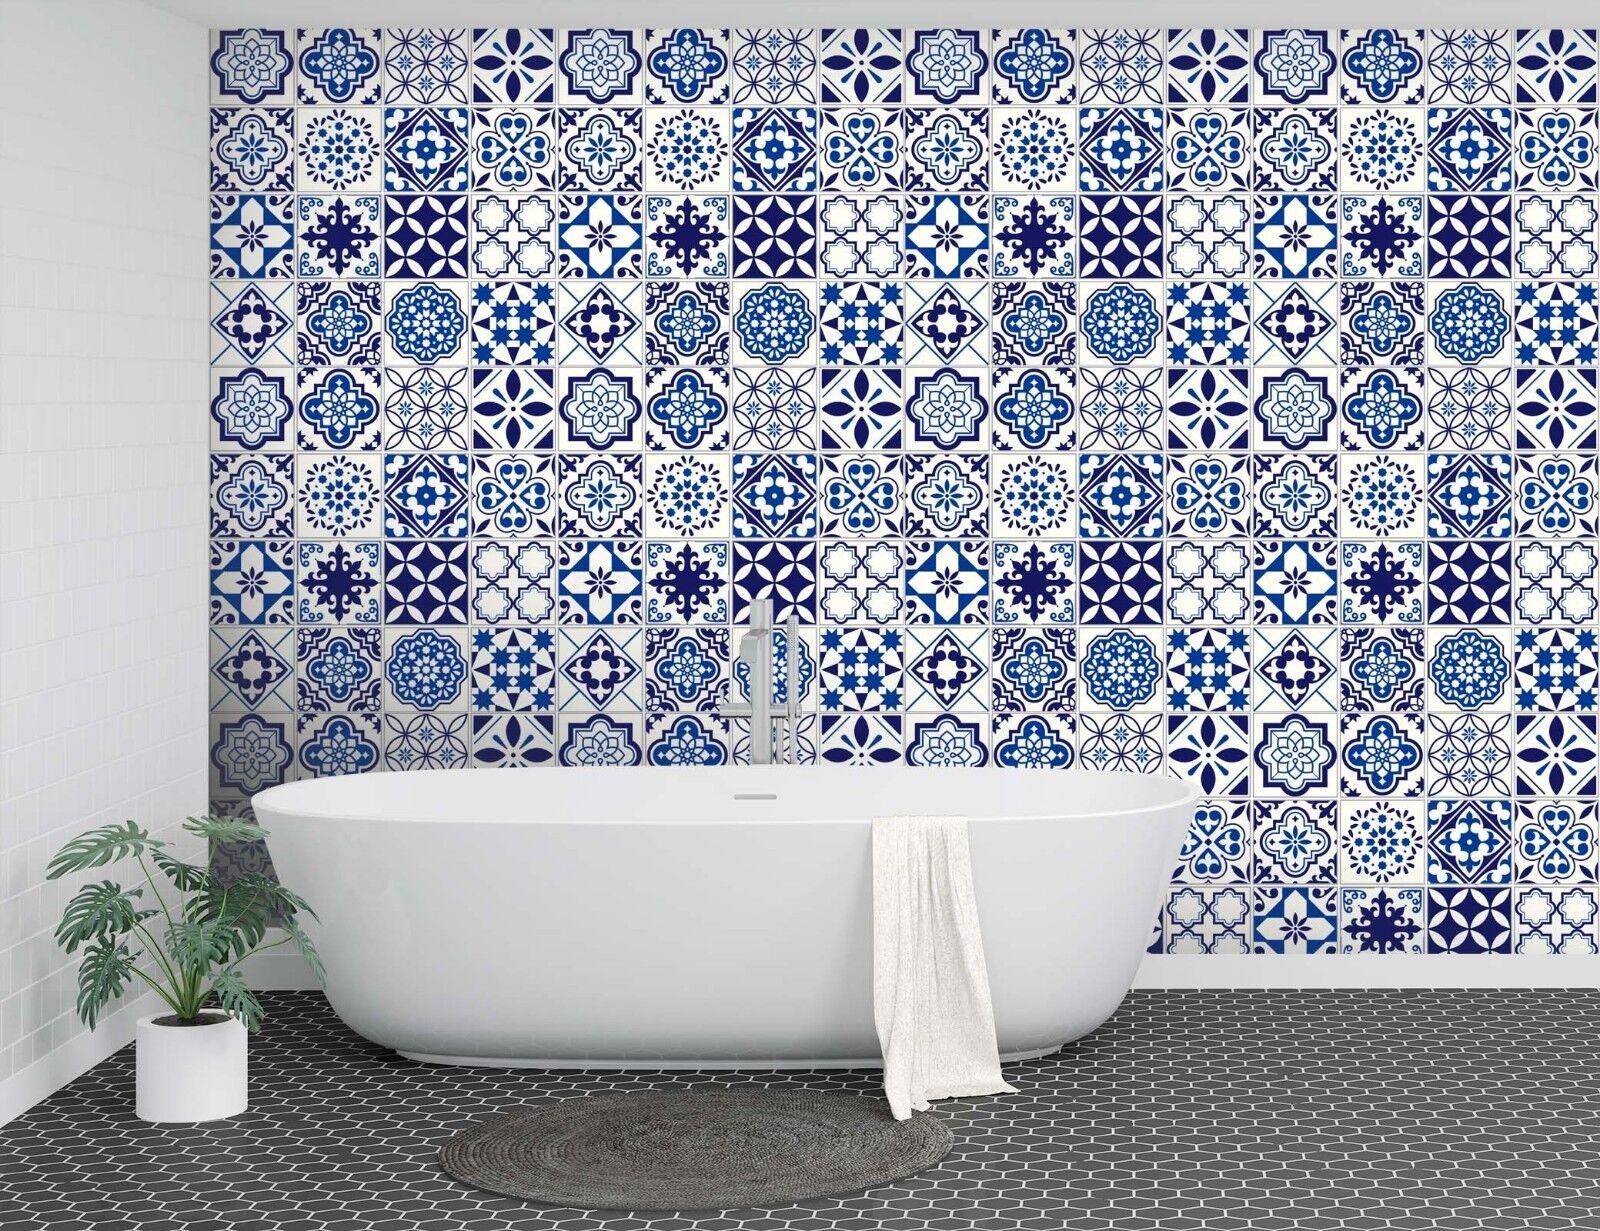 3D Hohl Blau Blaume 2 Textur Fliesen Marmor Tapeten Abziehbild Tapete Wandbild